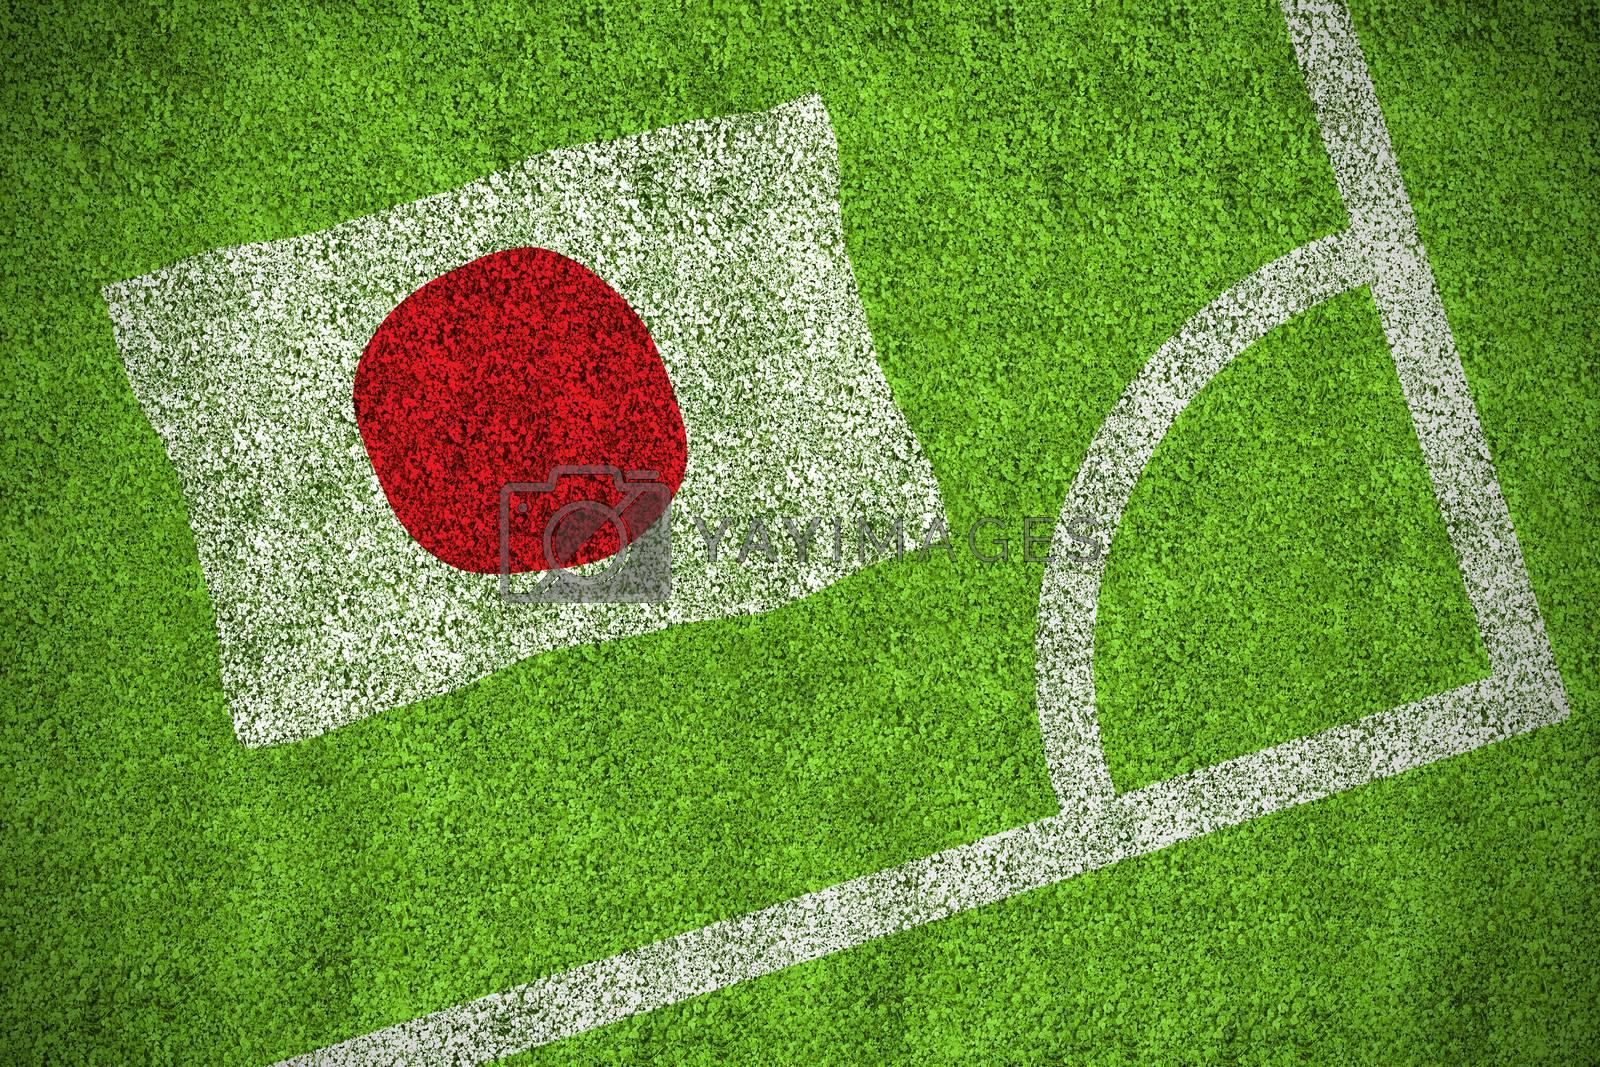 Japan national flag by Wavebreakmedia